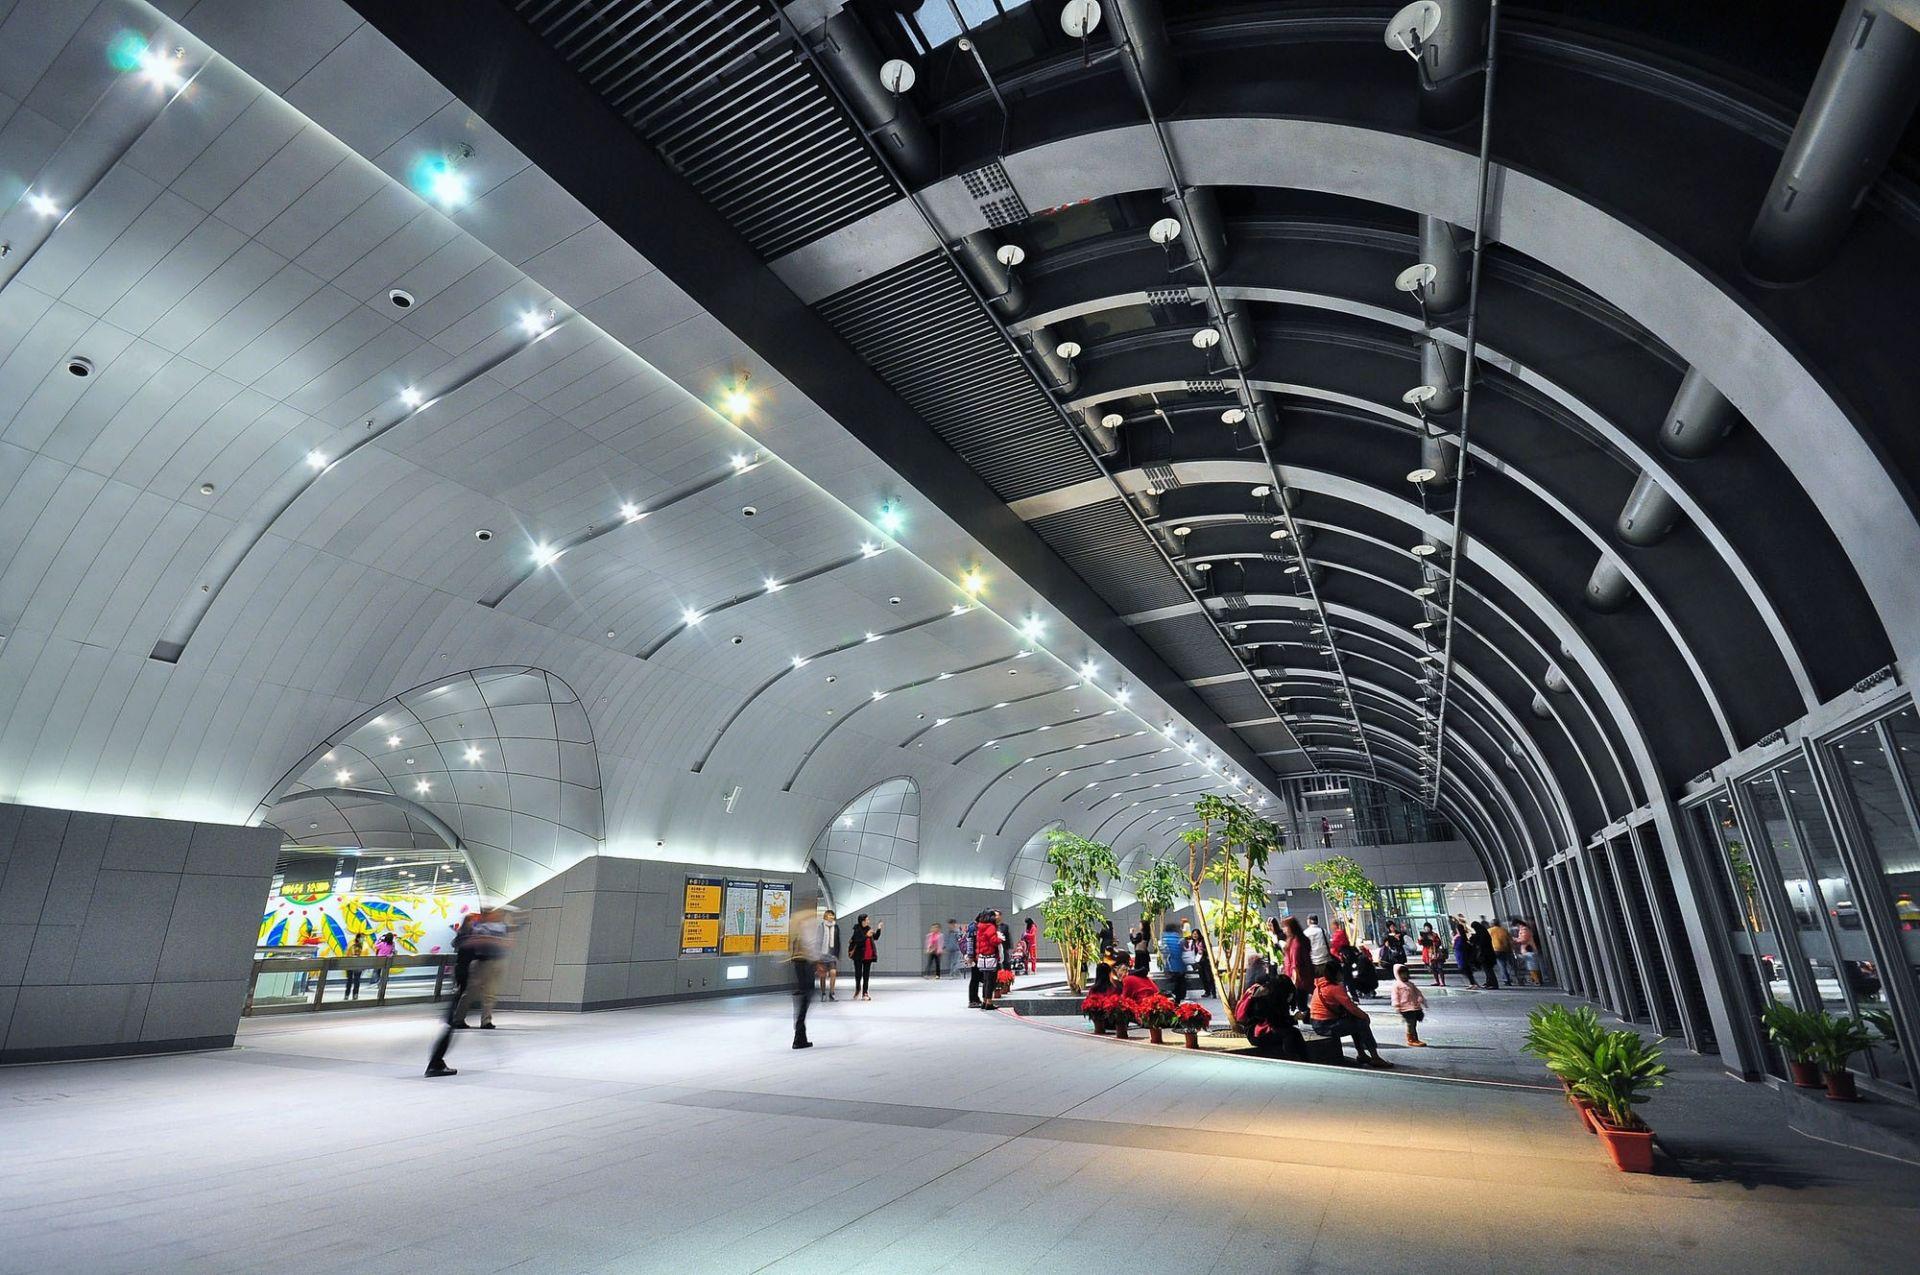 Taipei MRT Daan Park Station - interior - modlar com